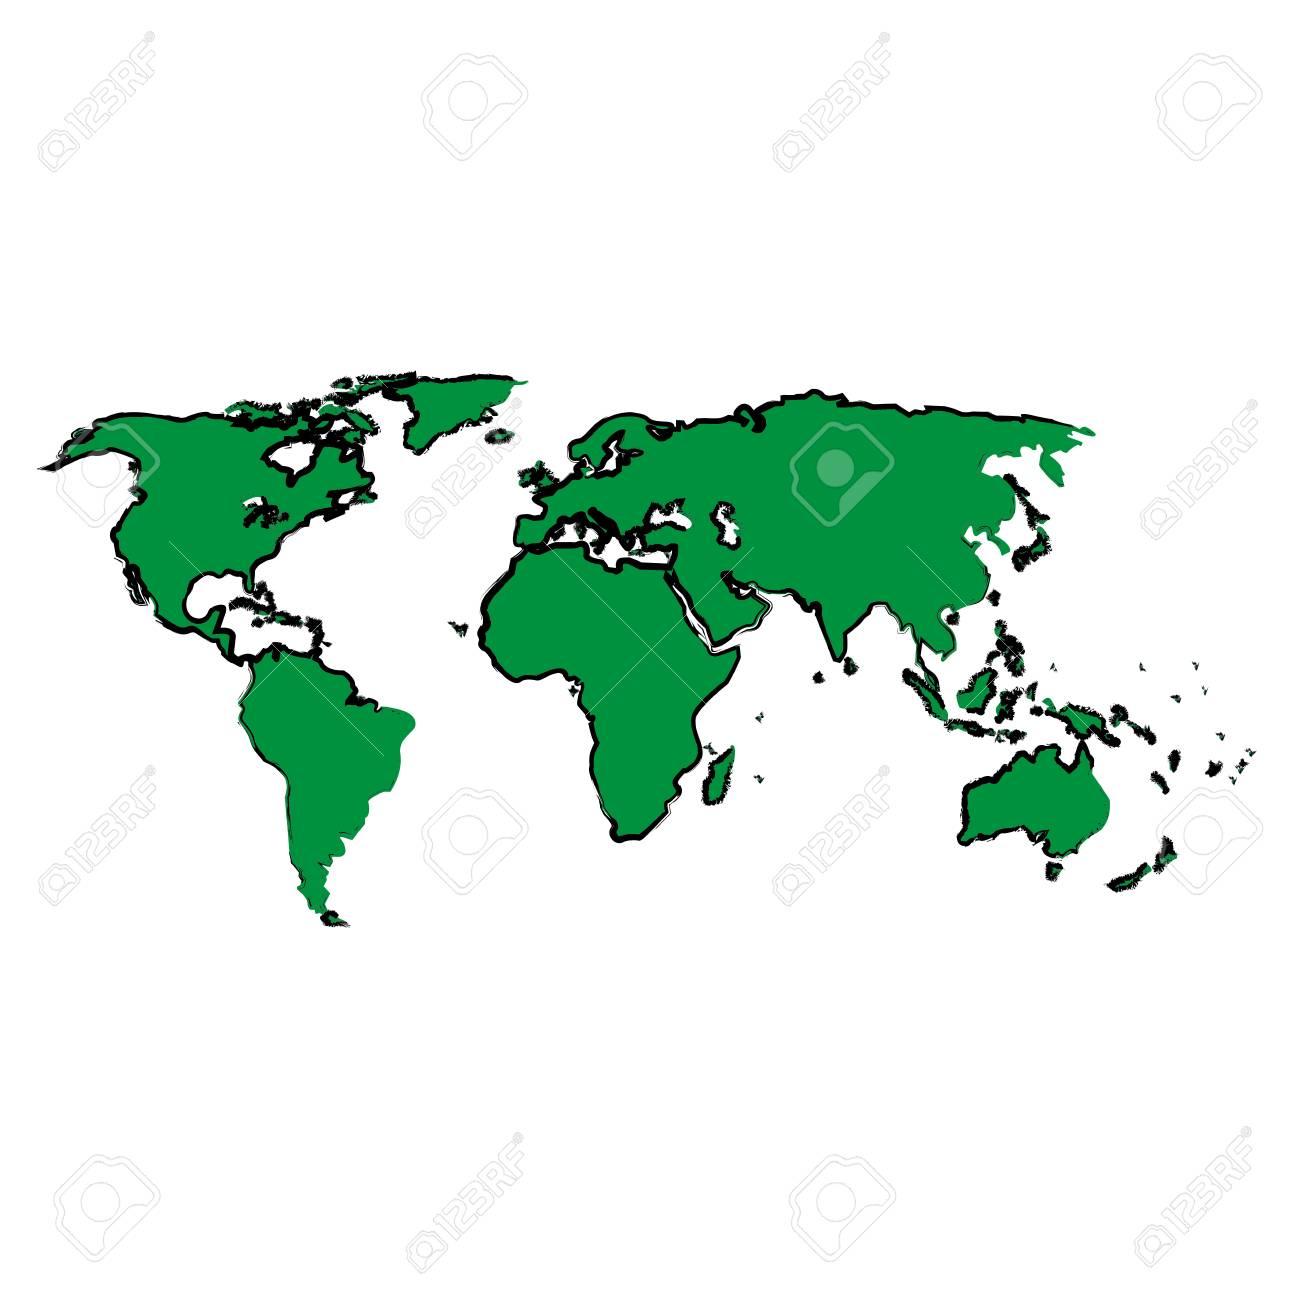 Continent Drawing At Getdrawings